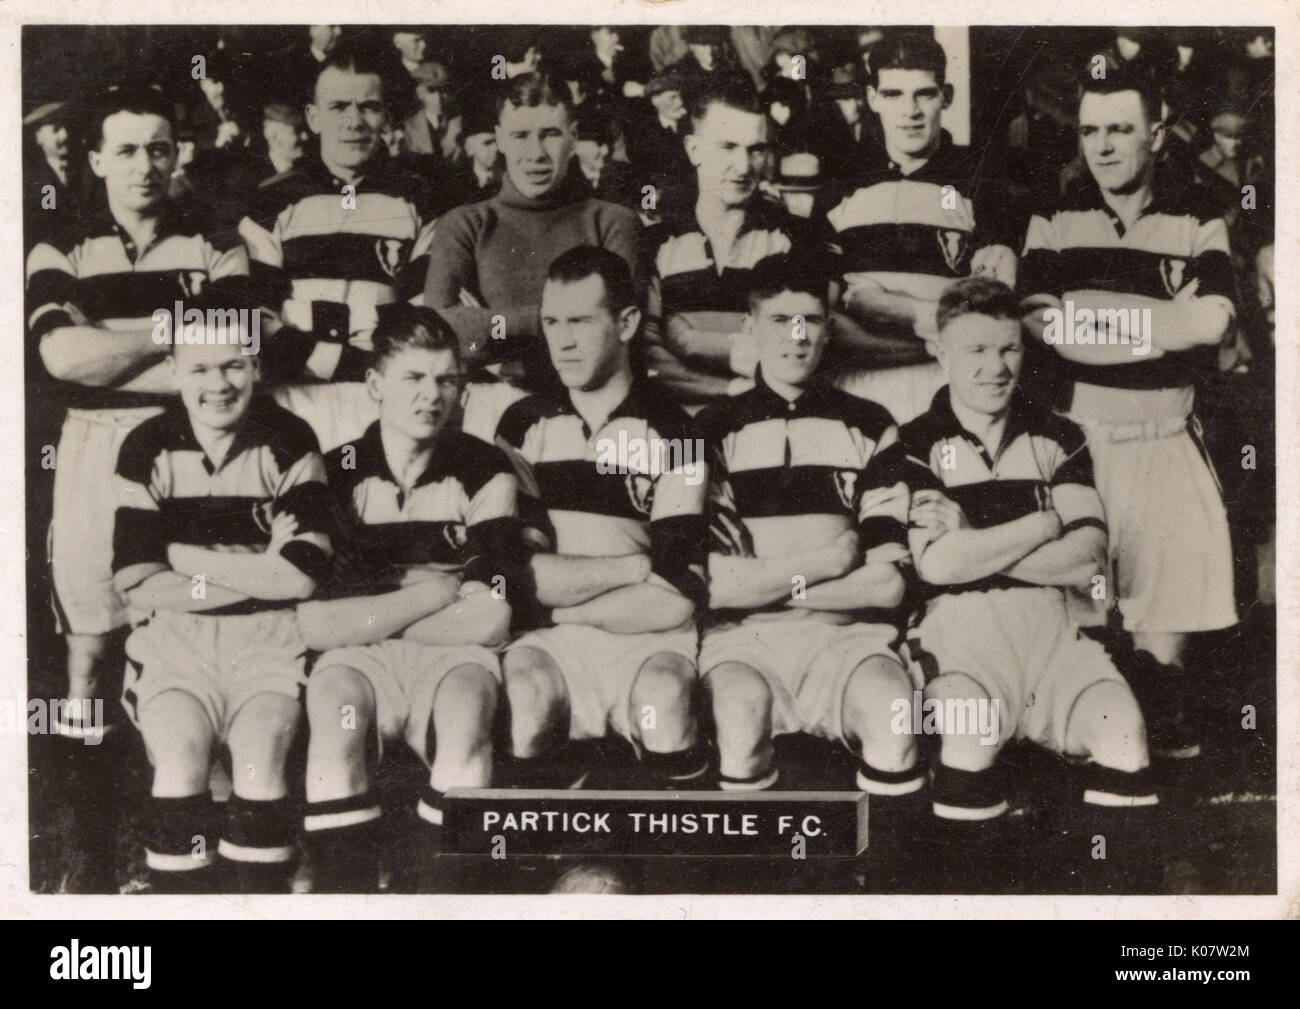 Partick Thistle FC football team 1936. Back row: Calderwood (Captain), Cummings, Johnstone, Elliot, Sutherland, M'Leod. Front row: Regan, M'Kennan, Wylie, Hastie, M'Lennan.     Date: 1936 - Stock Image